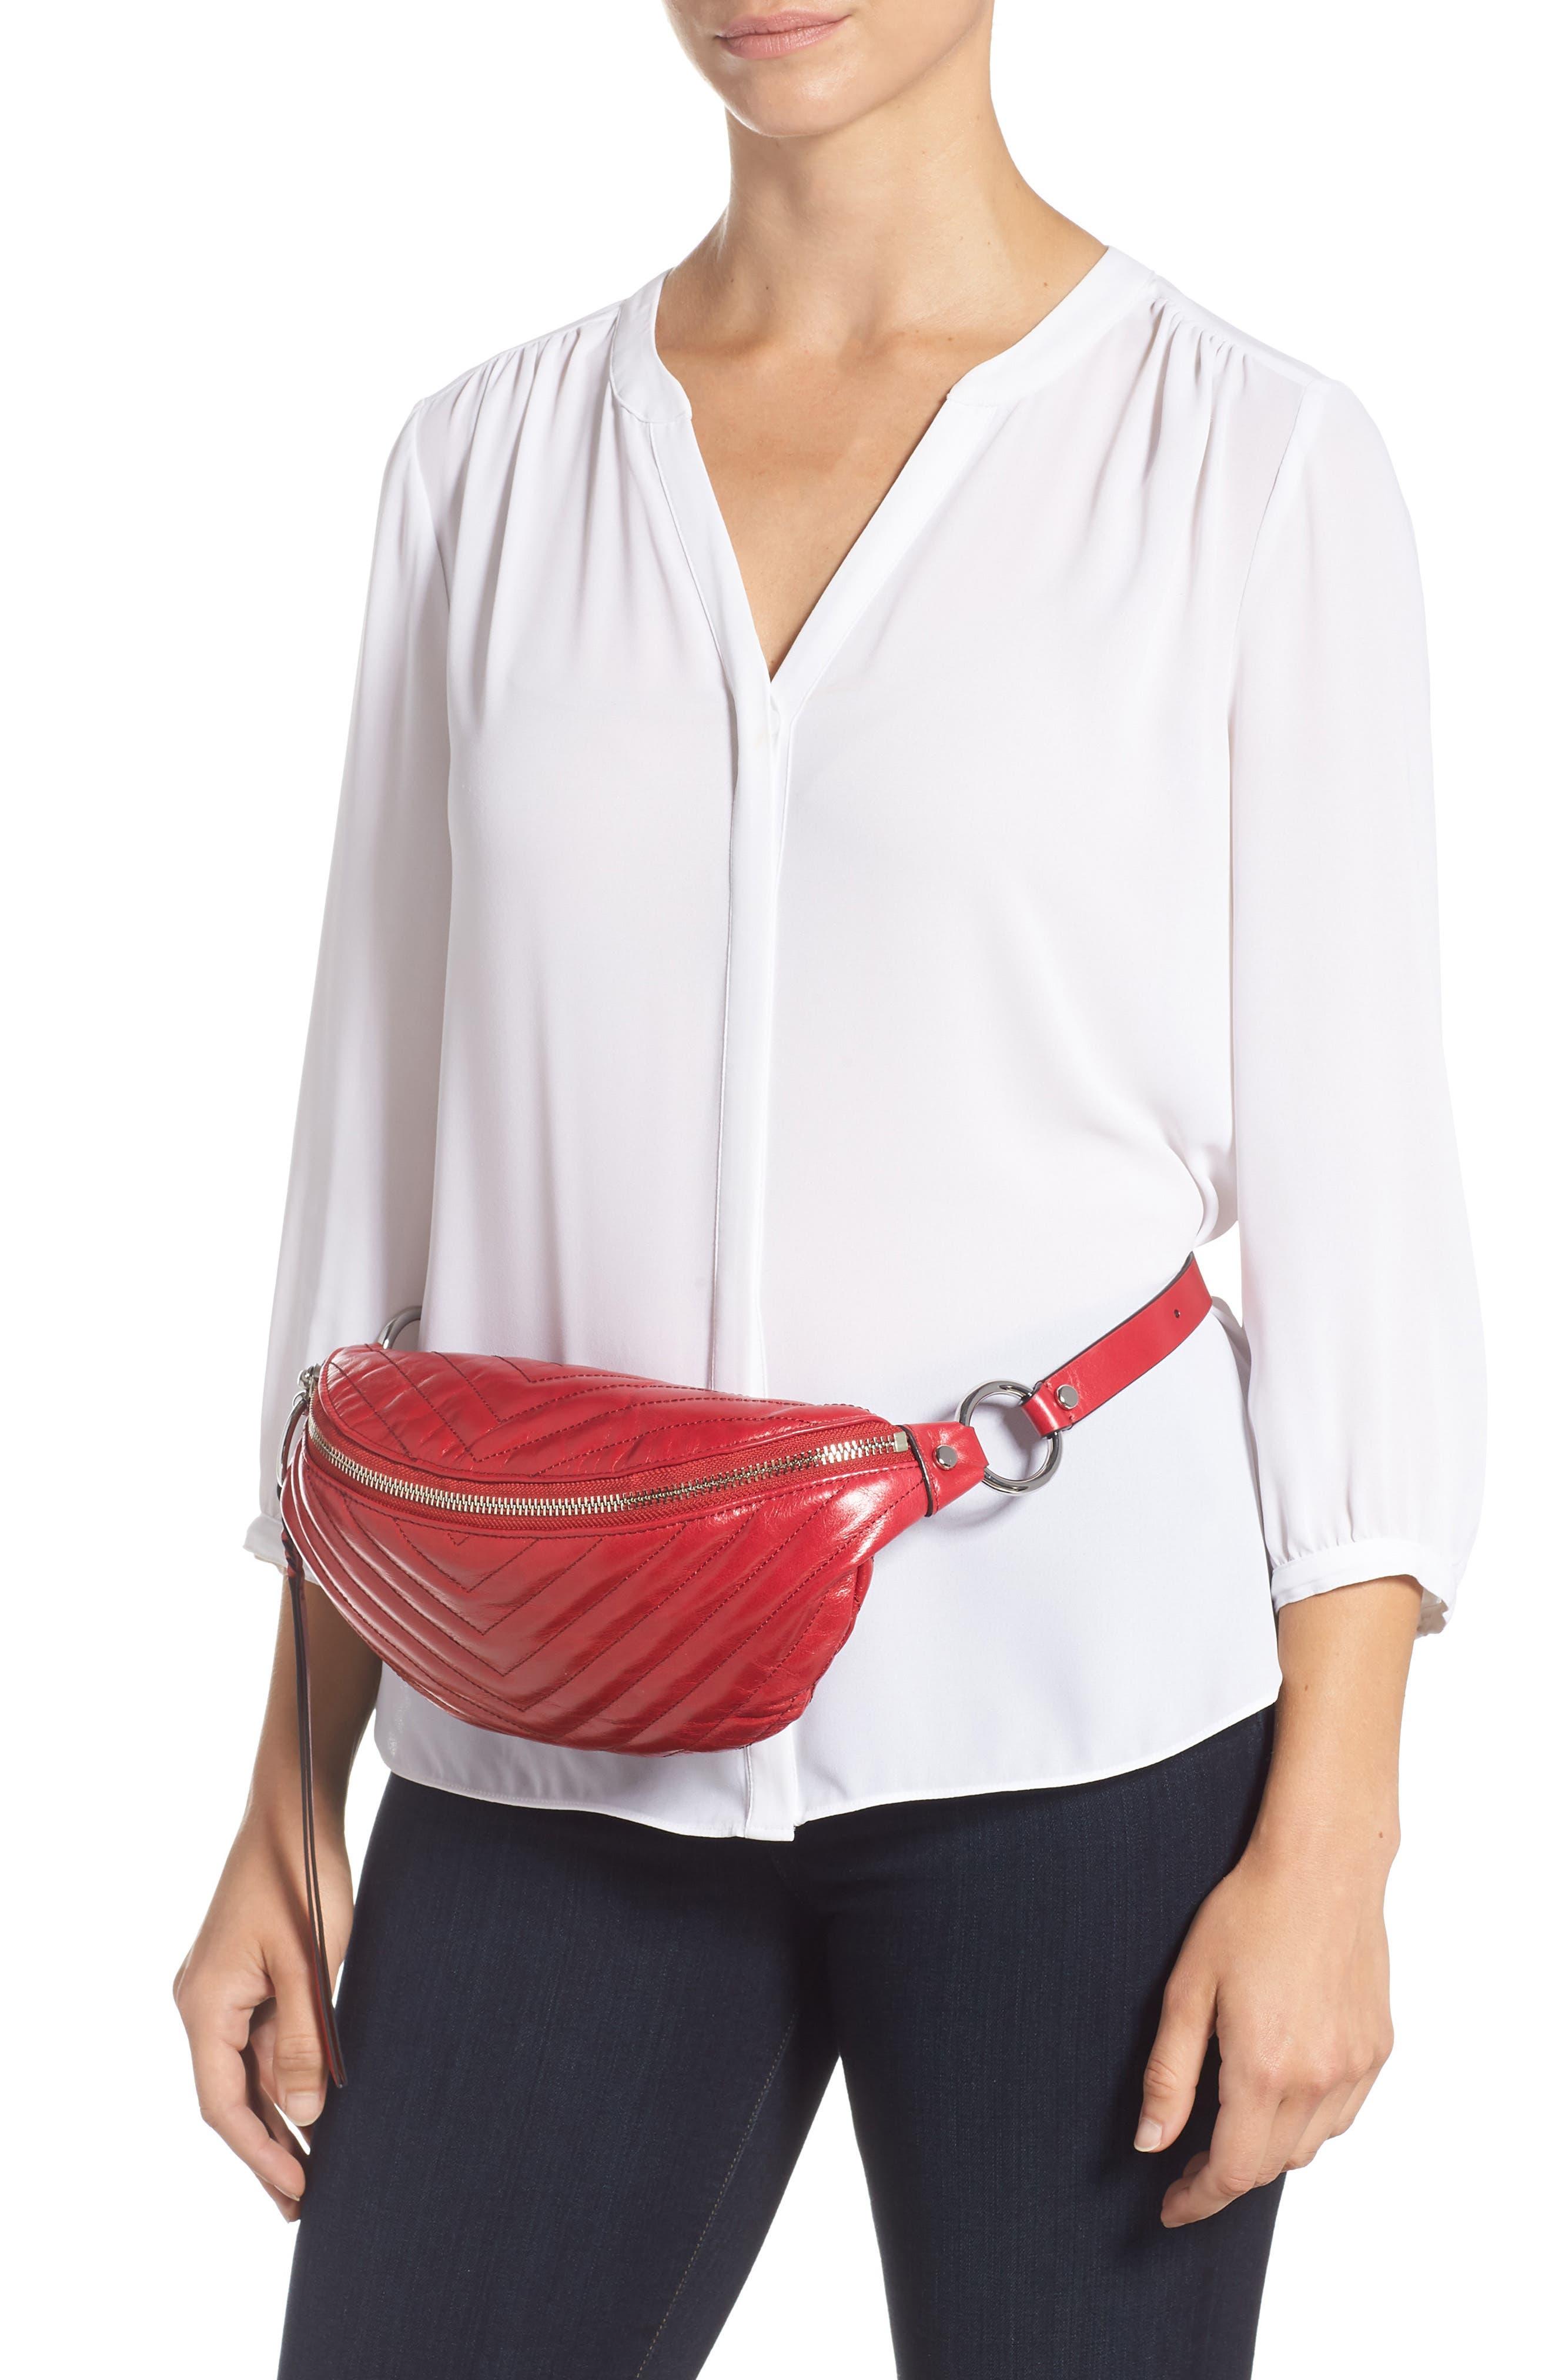 REBECCA MINKOFF, Edie Leather Belt Bag, Alternate thumbnail 2, color, 600